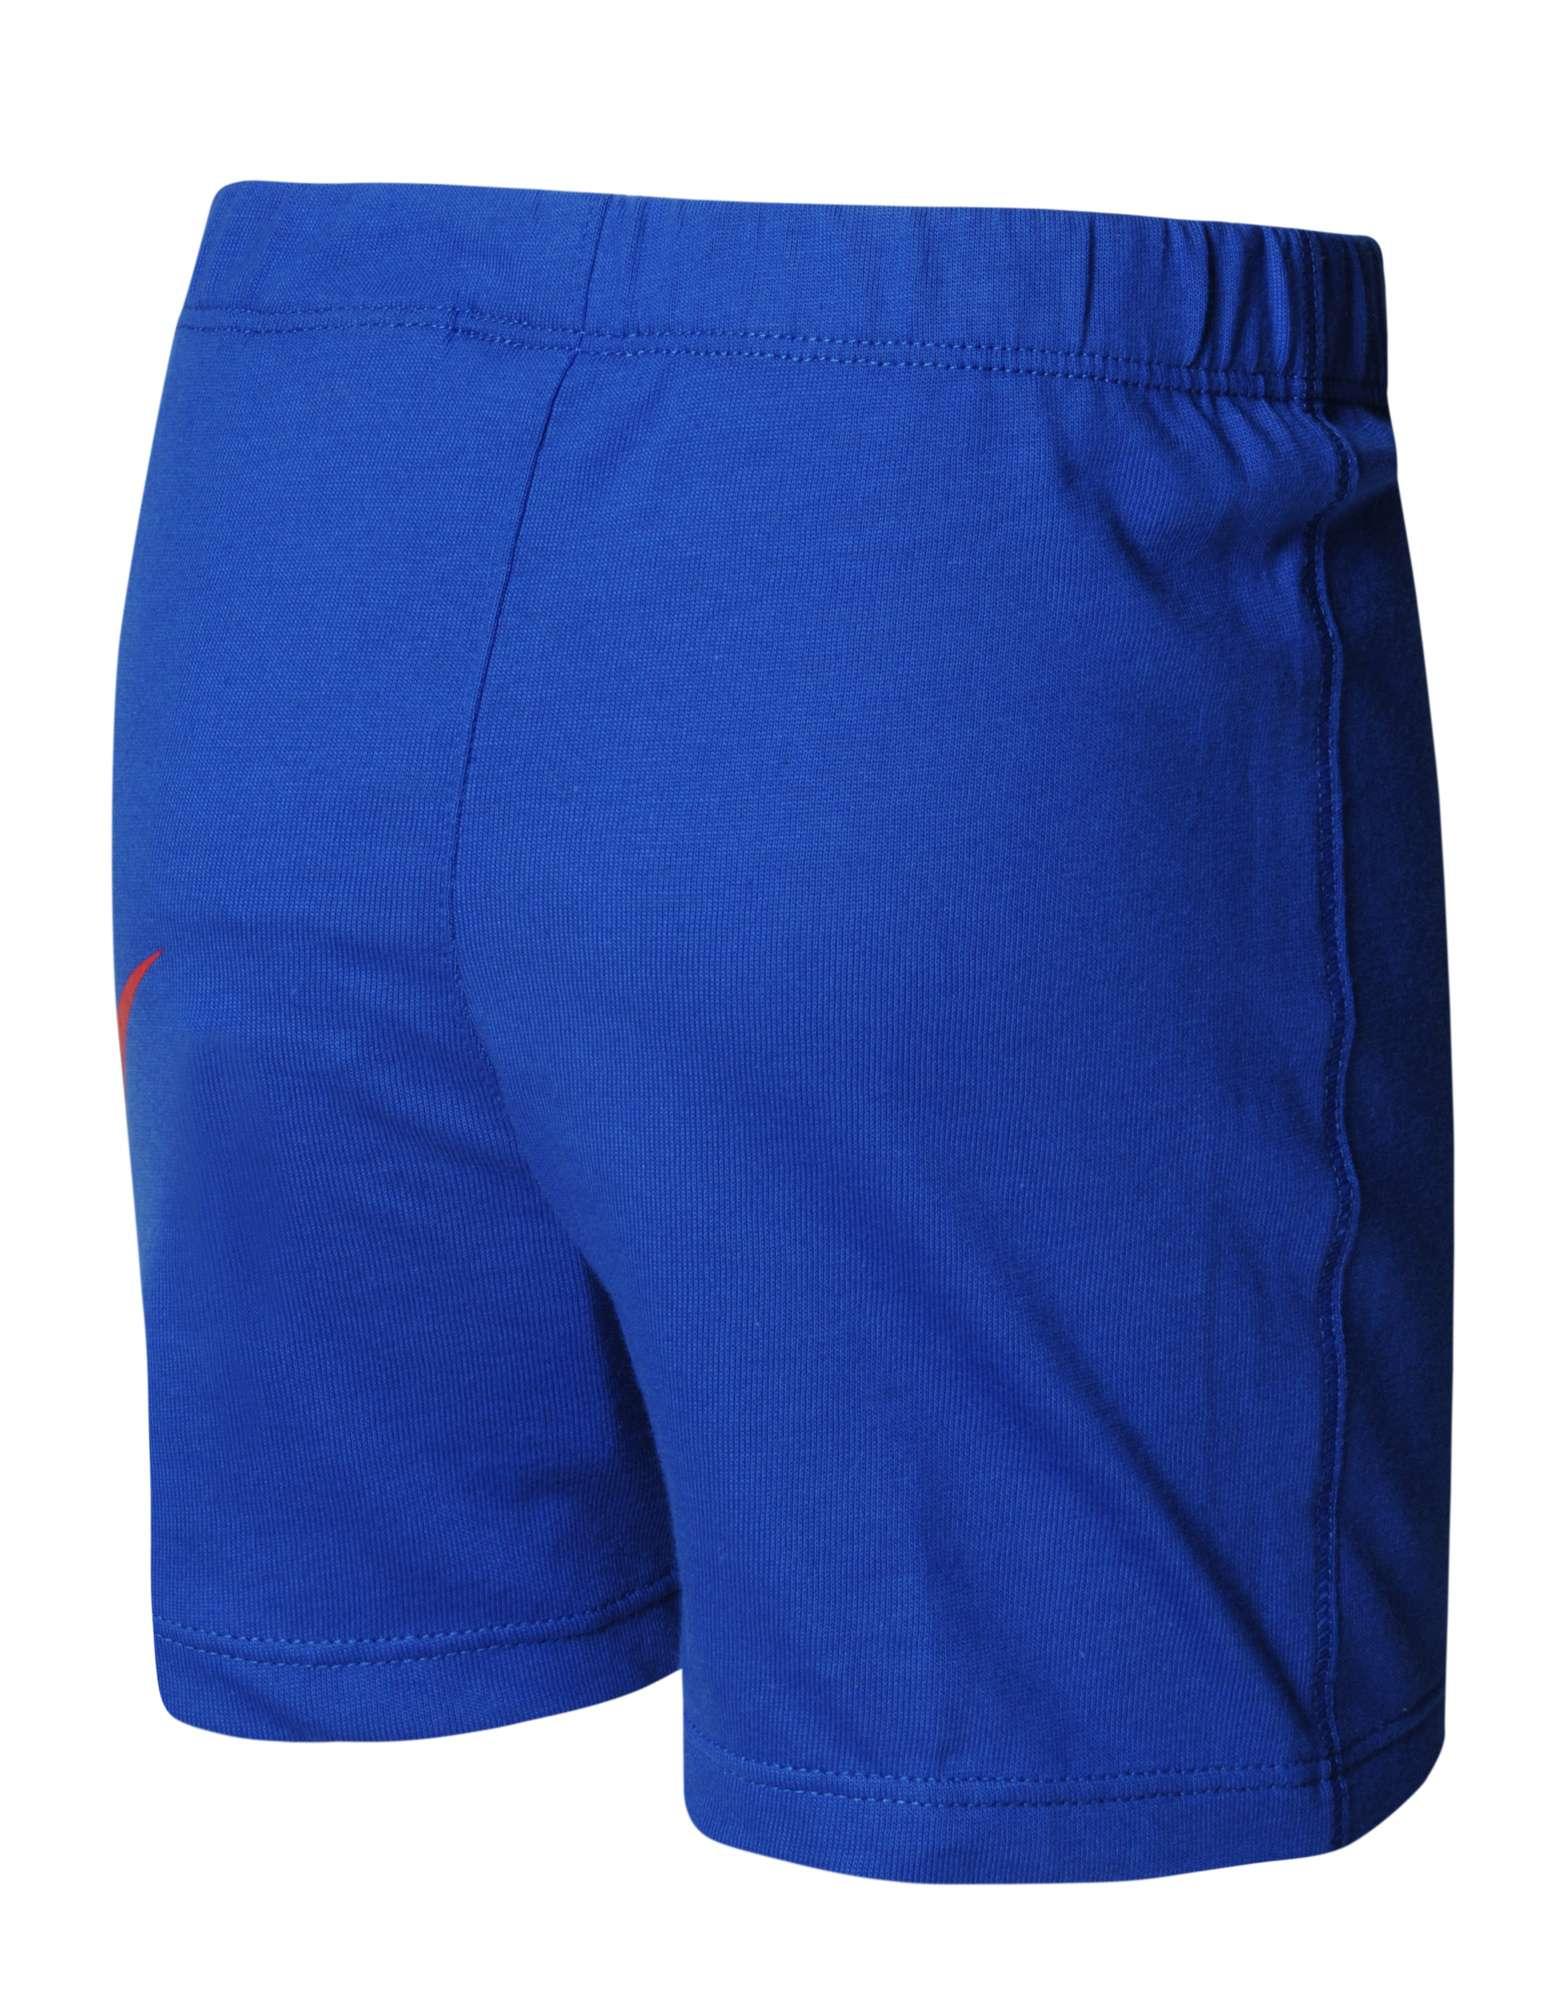 Nike Limitless Jersey Shorts Infants